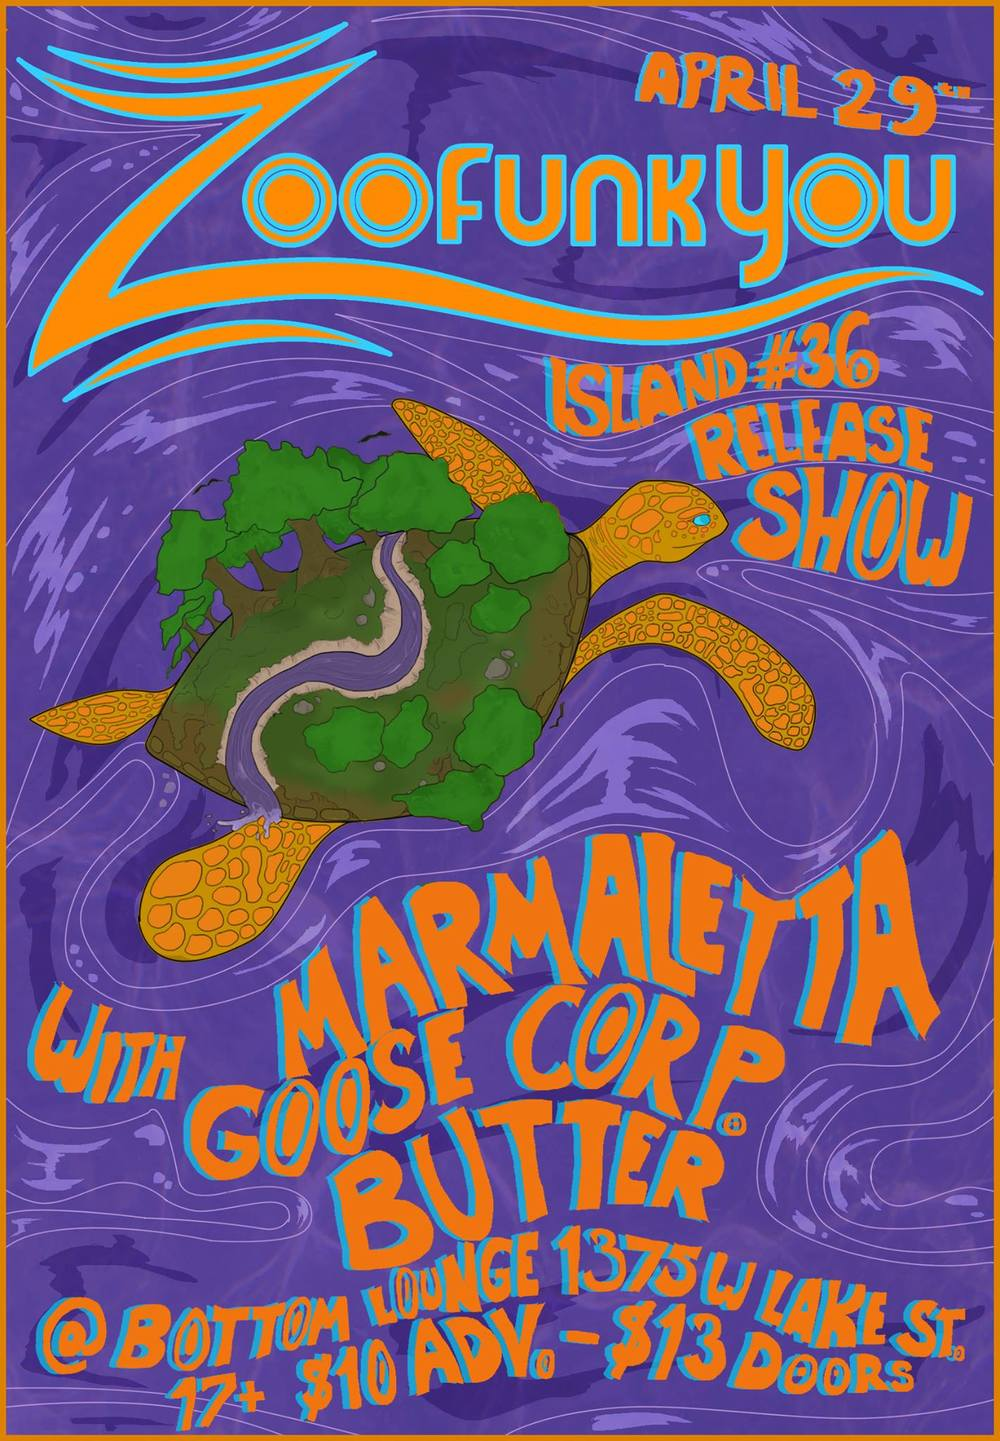 Island #36 release show natalia